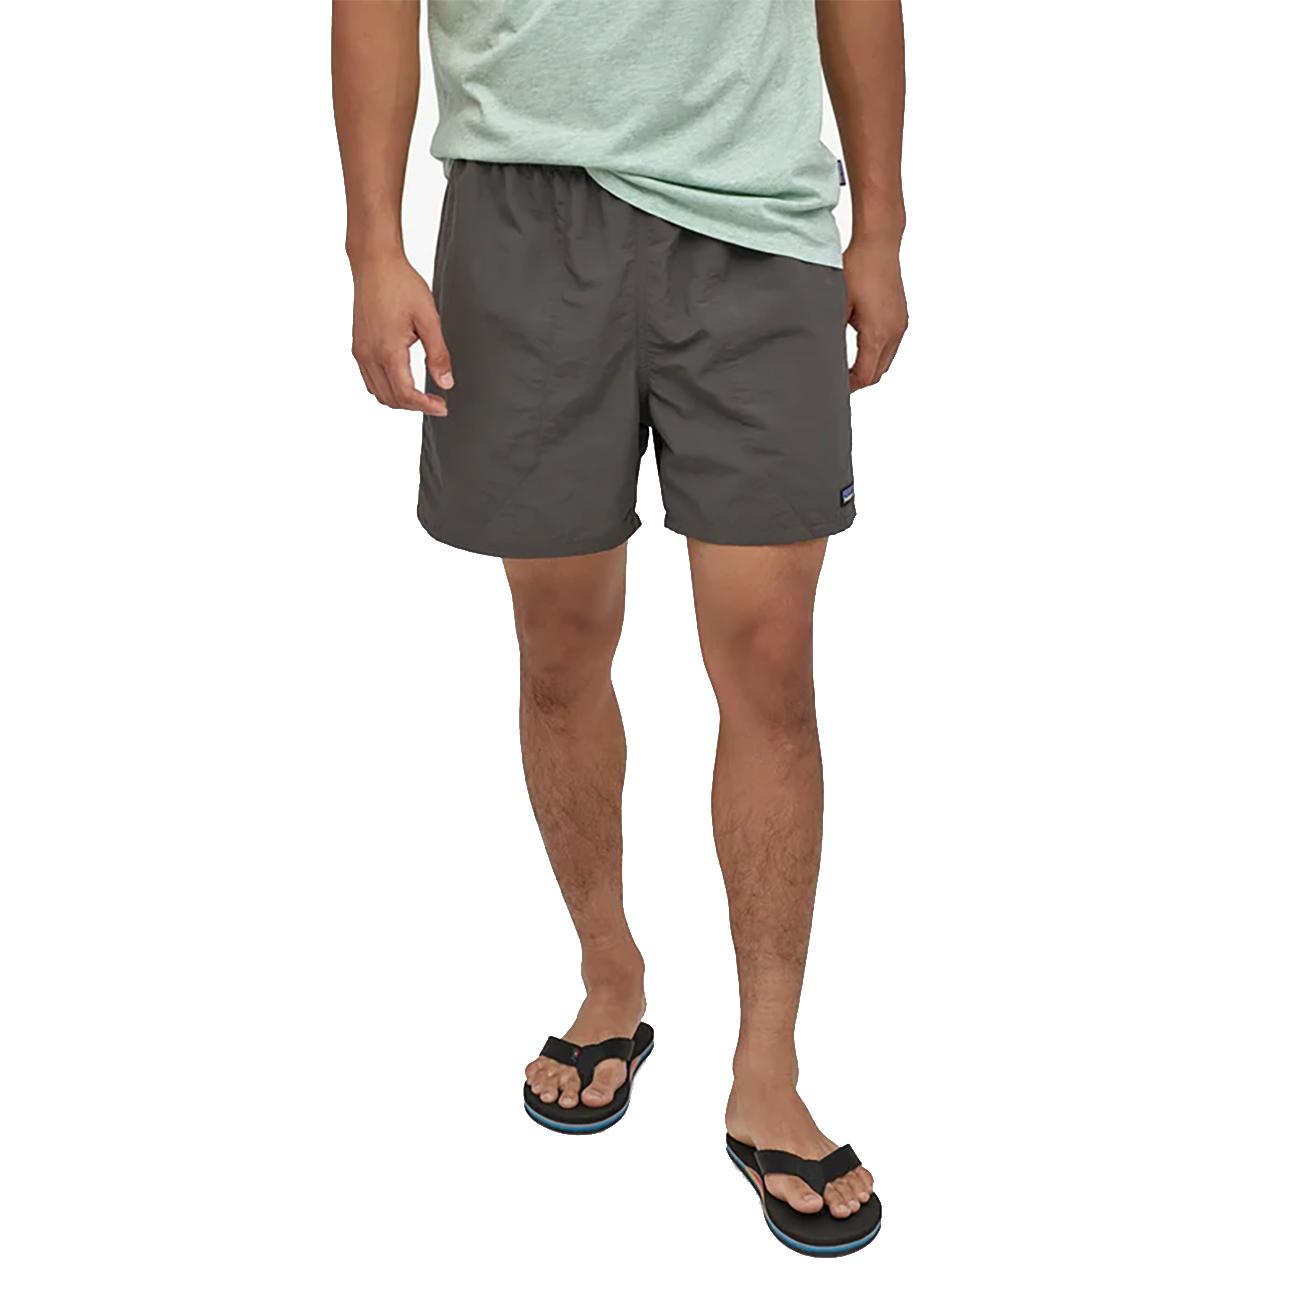 "Men's Baggies Shorts -5"", Forge Grey-2"